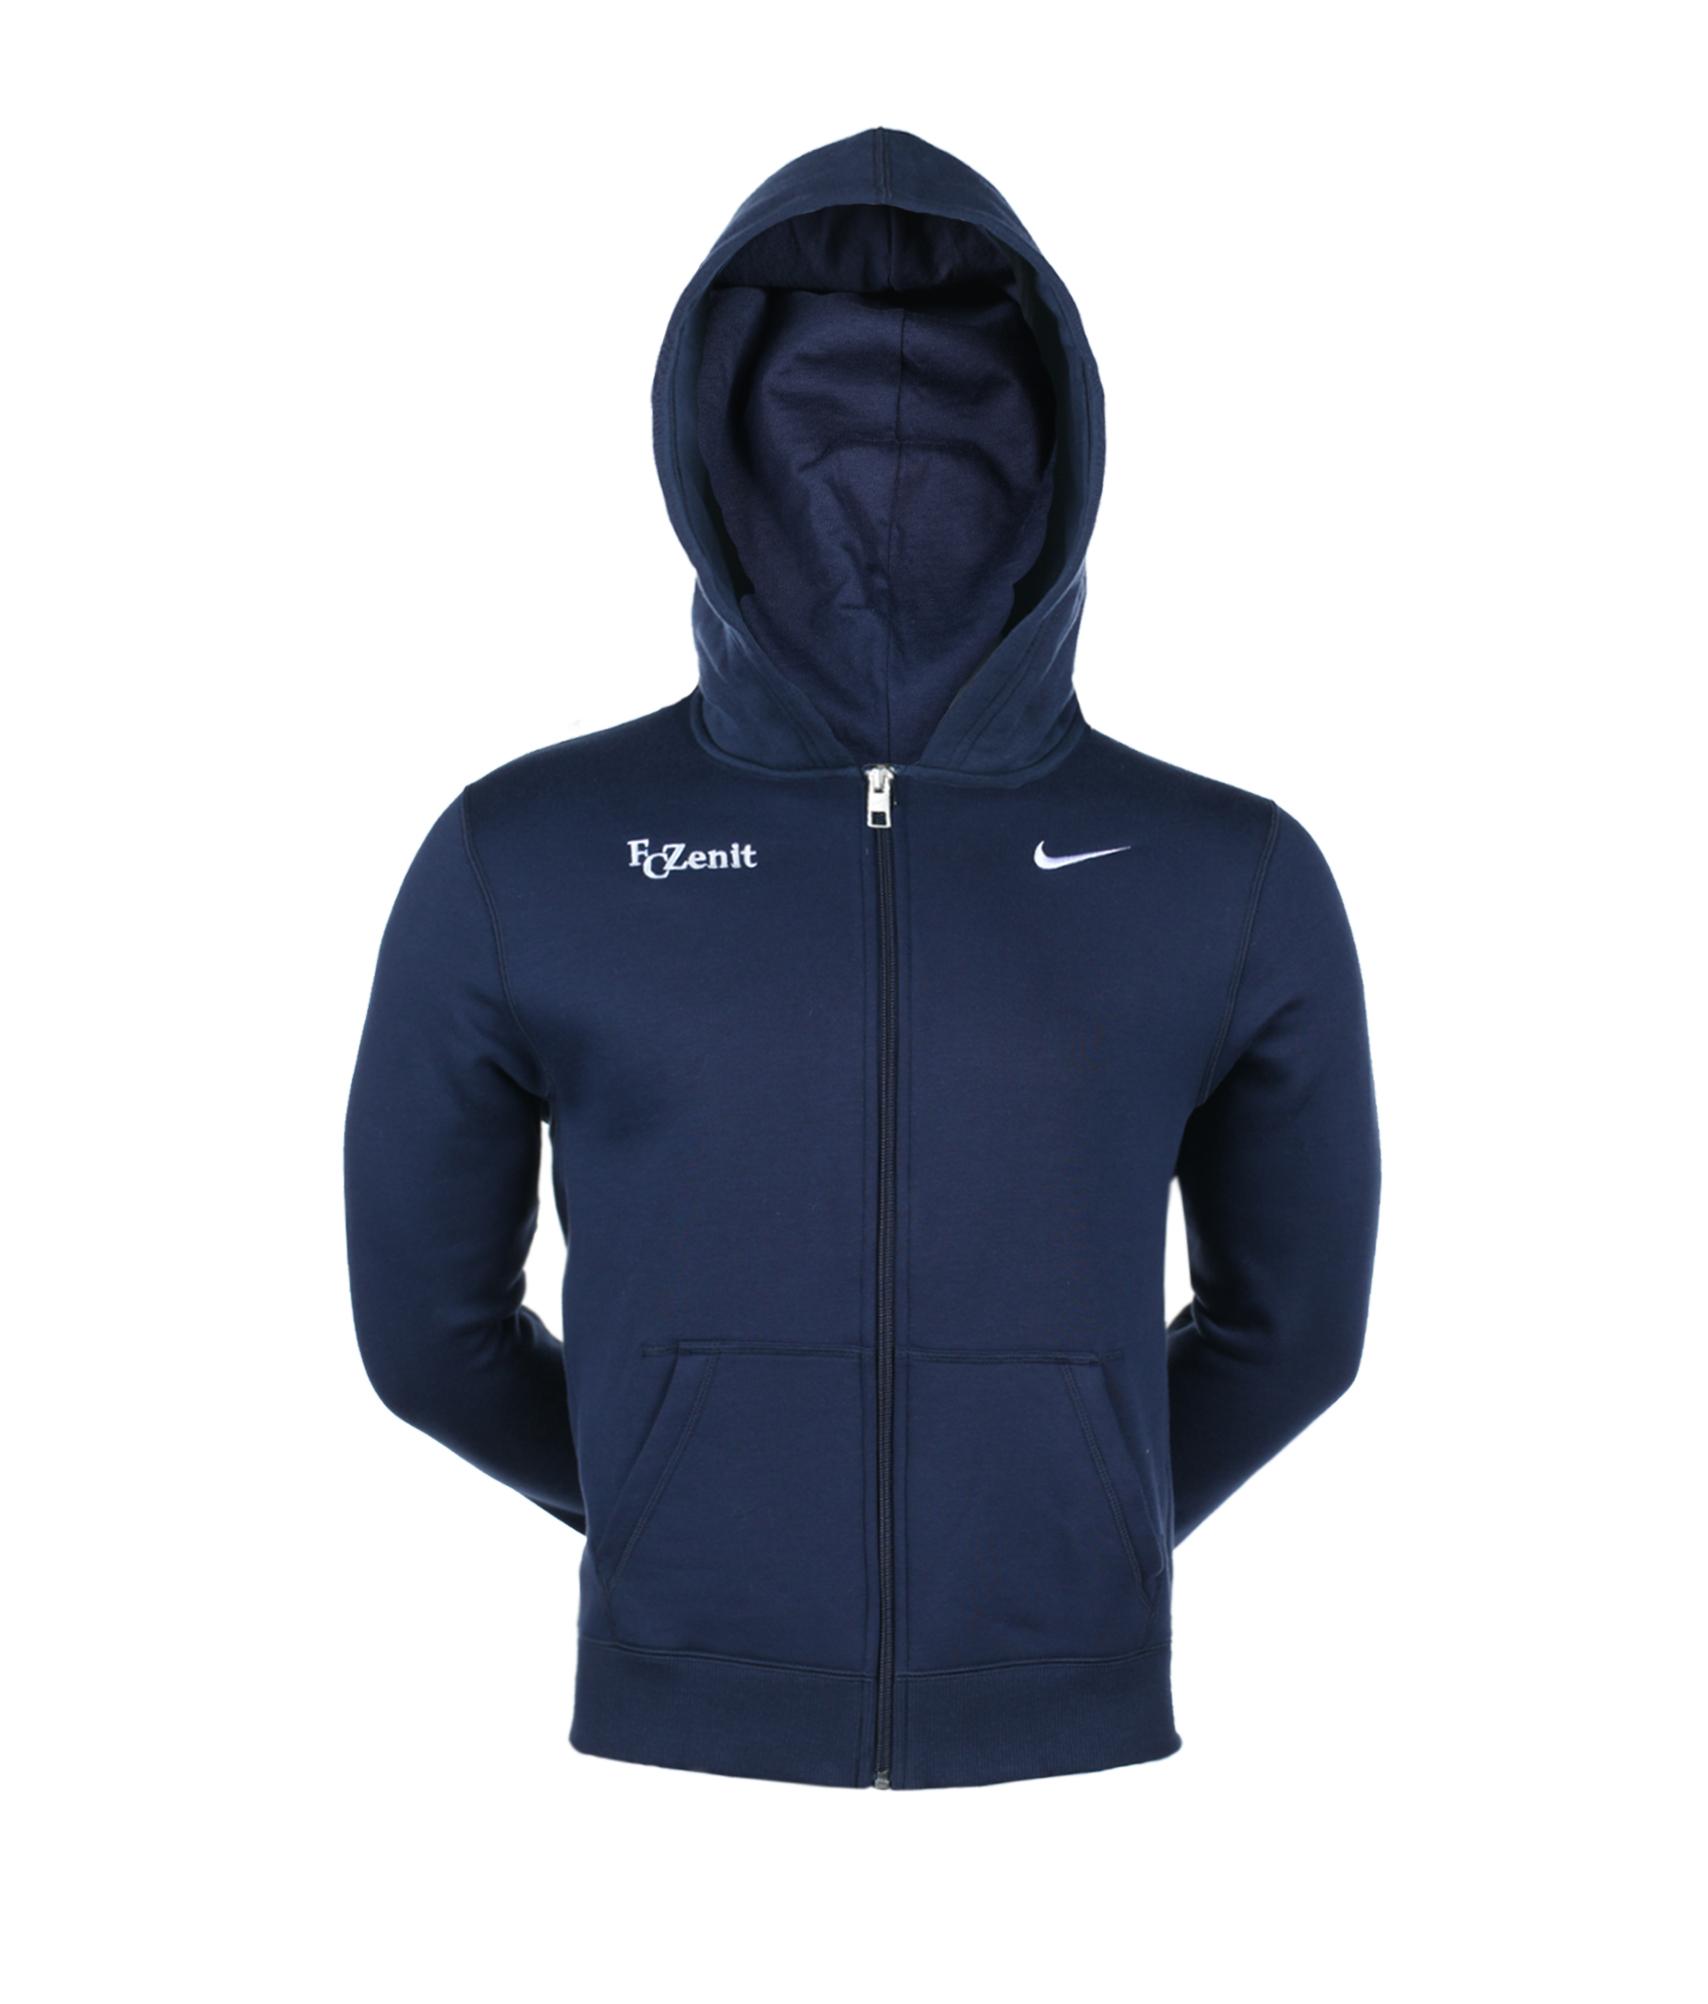 Толстовка Nike YA76 BF FZ HDY-BK, Размер-XL